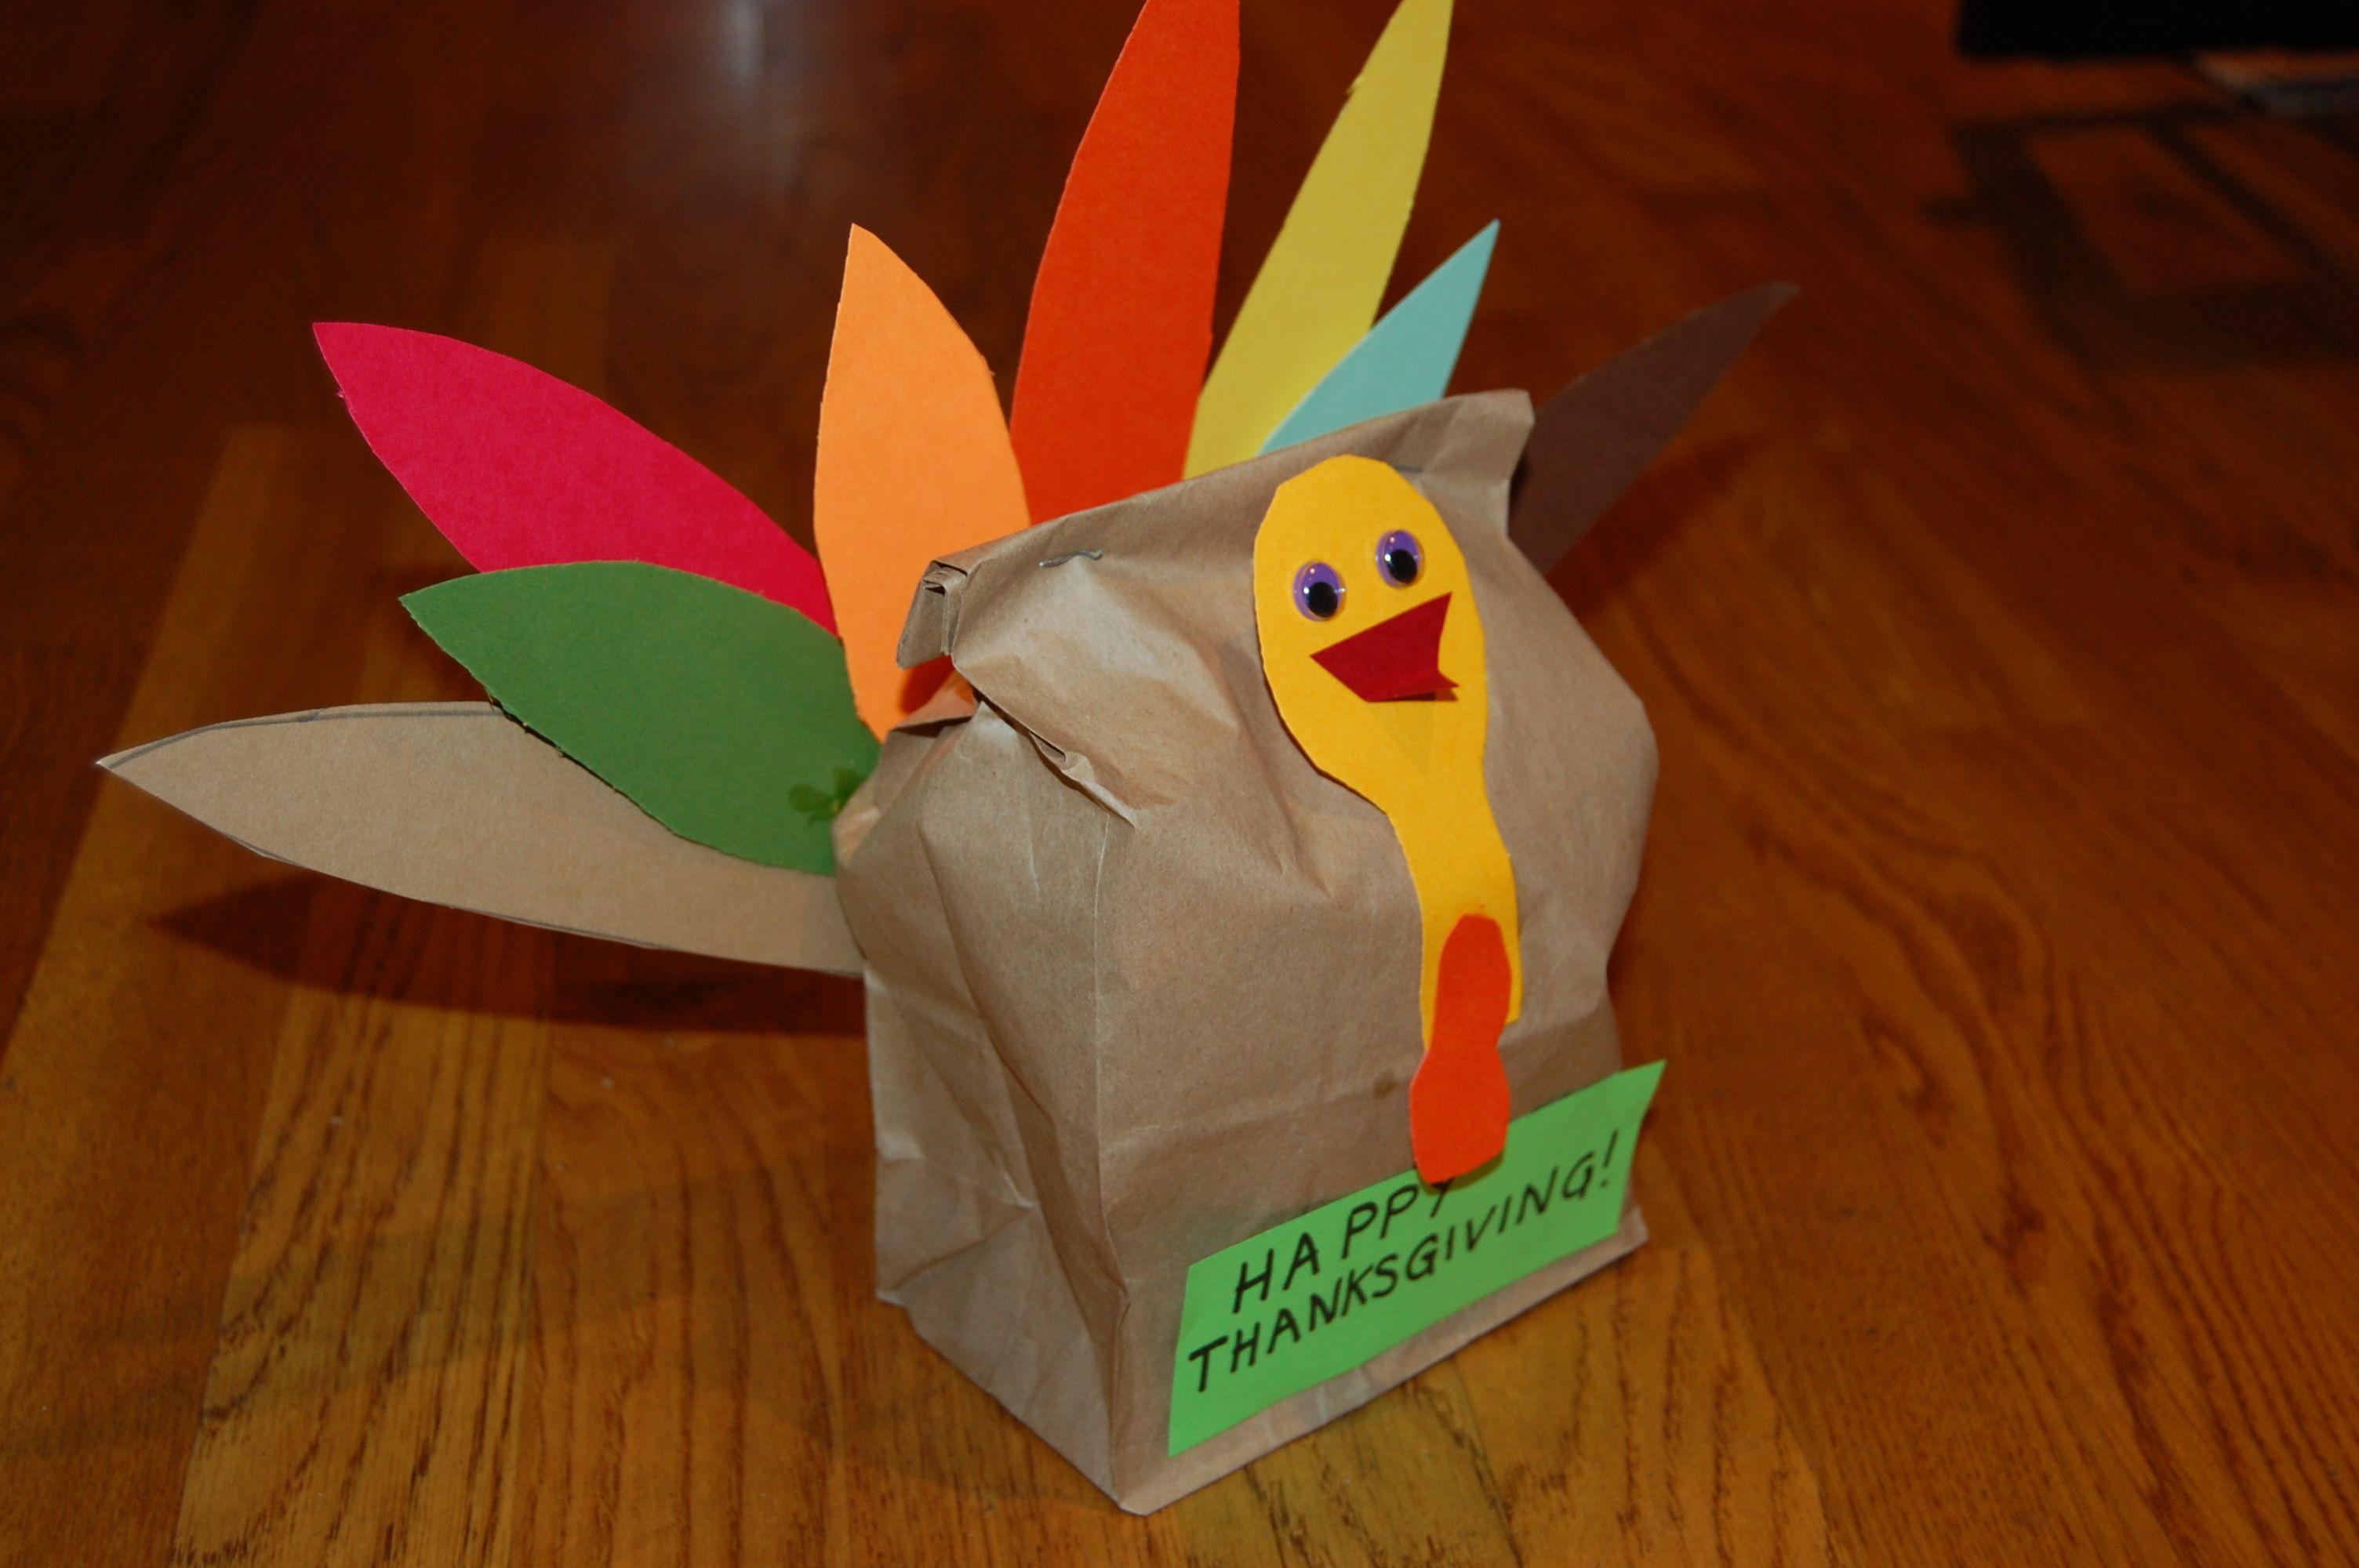 Preschool quick centerpieces for preschool thanksgiving tables preschool quick centerpieces for preschool thanksgiving tables make a paper bag turkey centerpiece with your jeuxipadfo Gallery